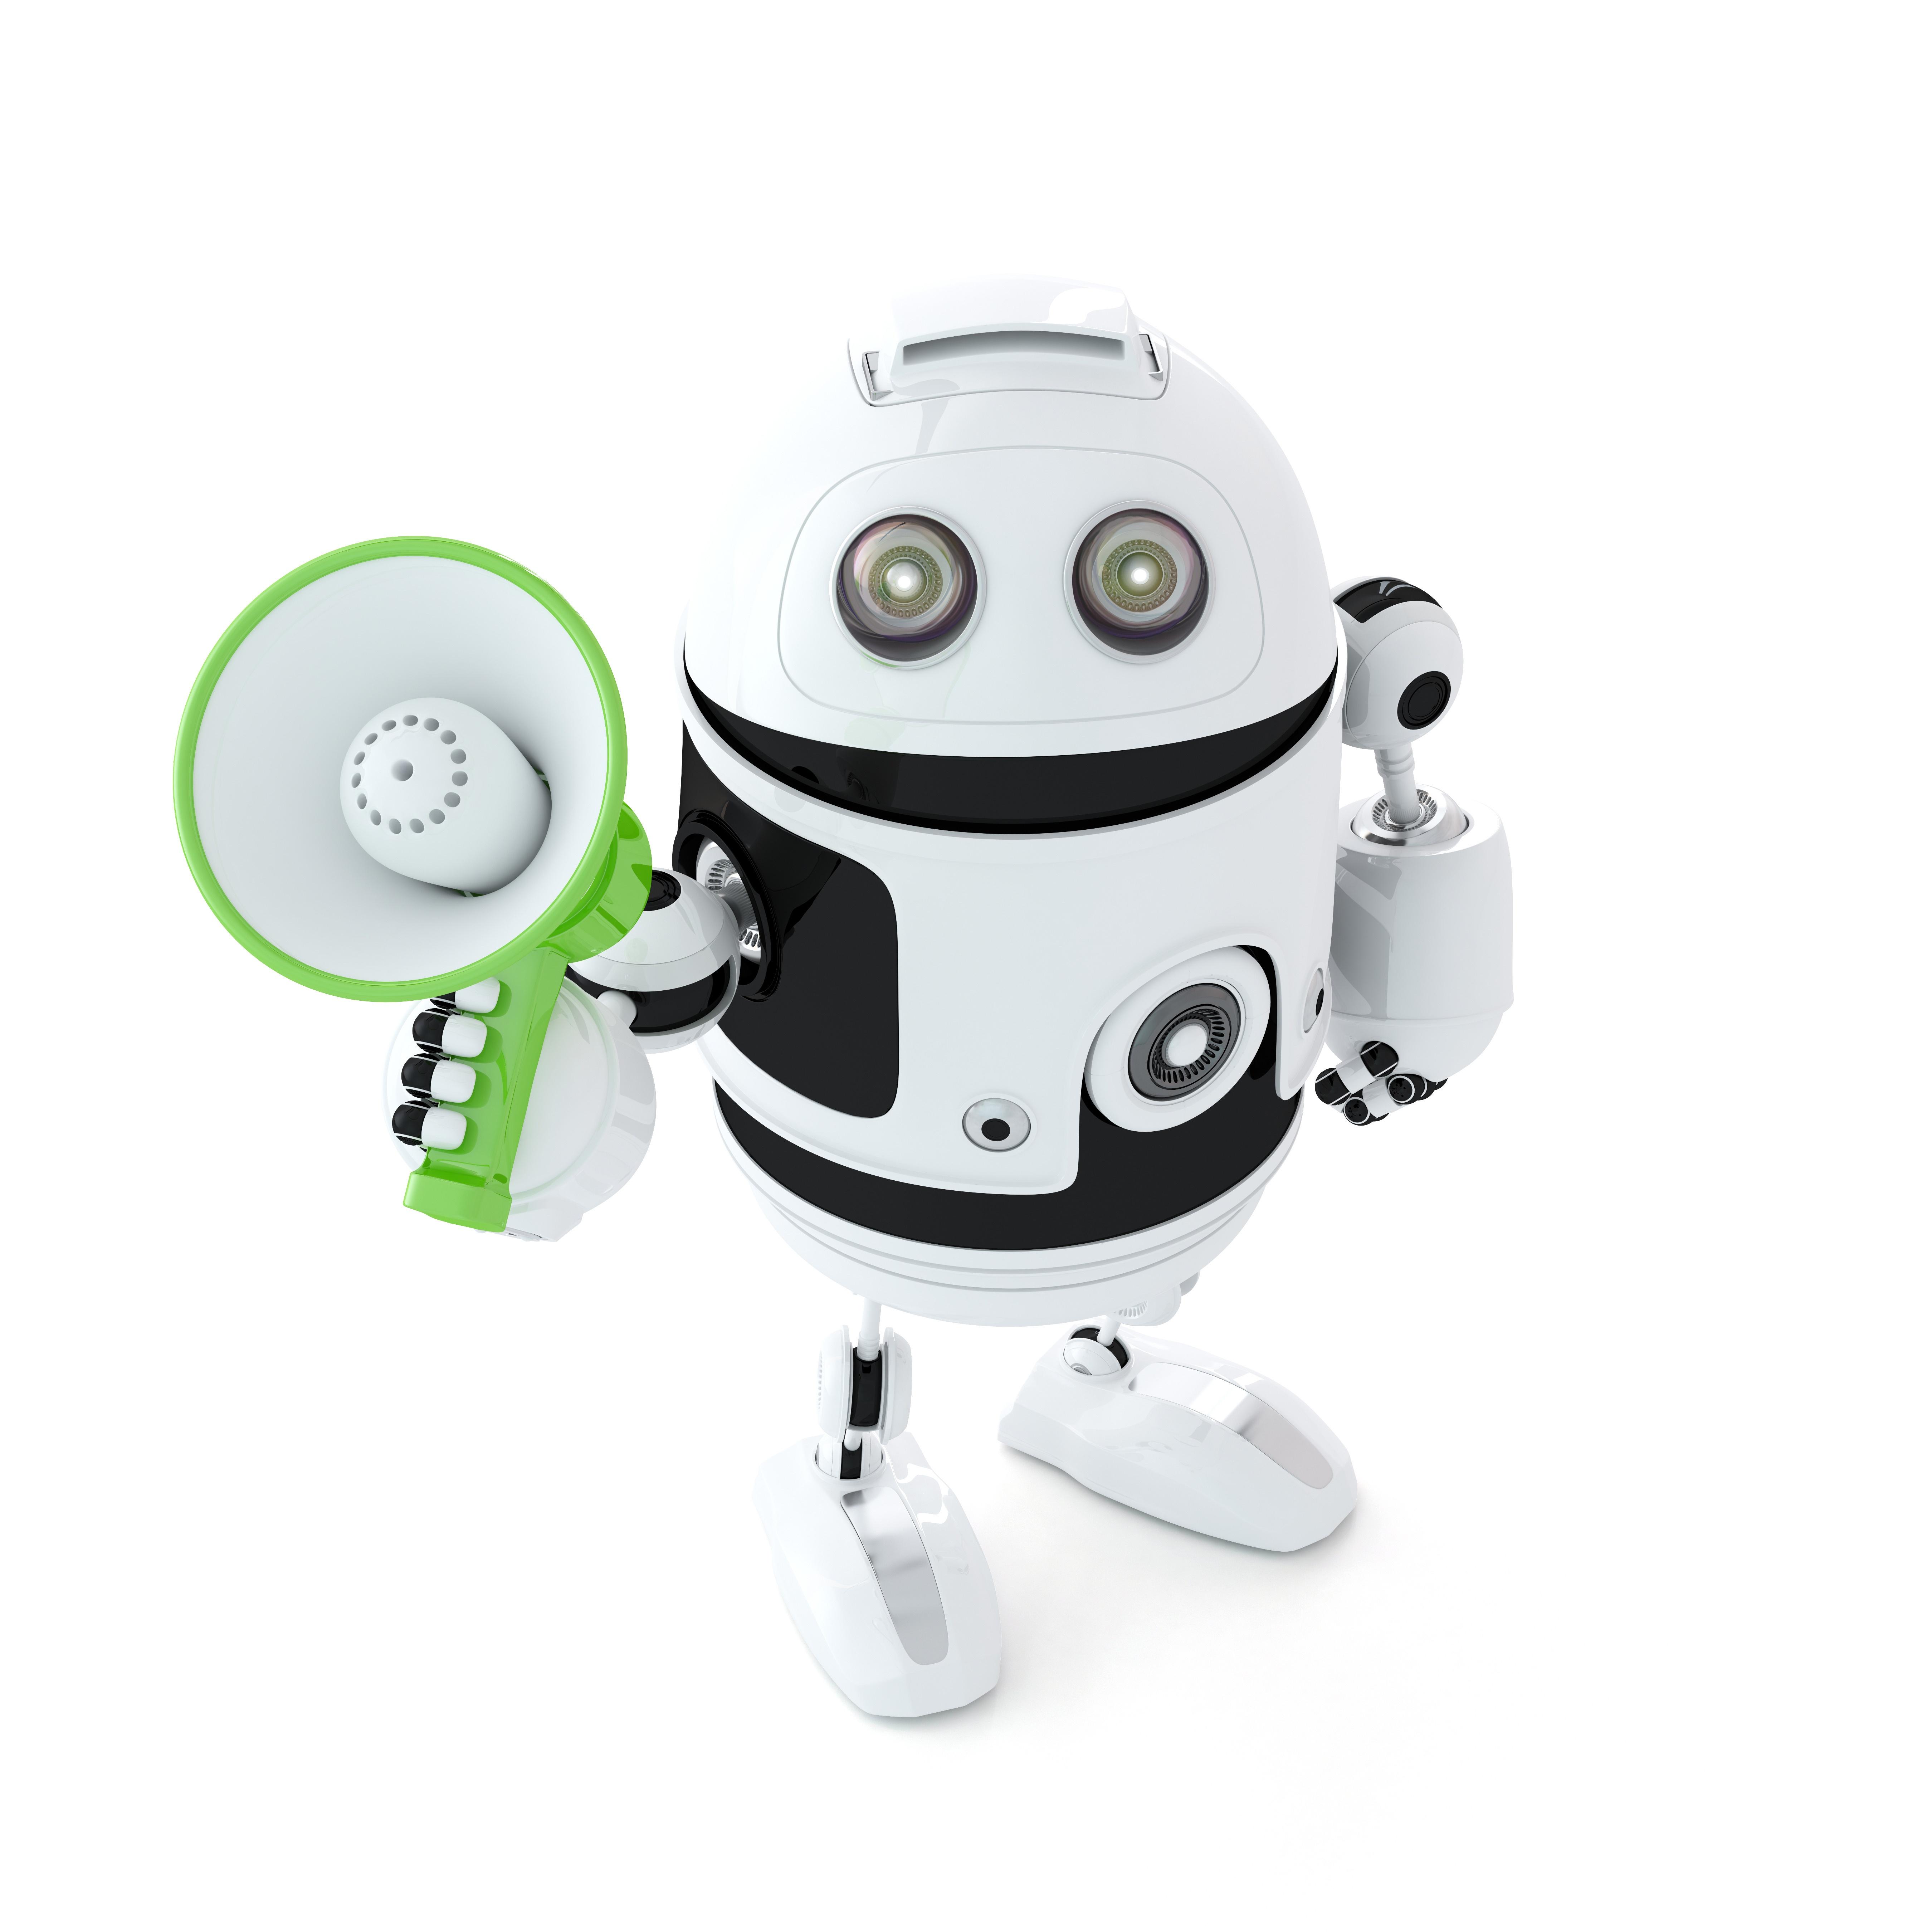 android-shouting-through-megaphone_fki1vq0u.jpg